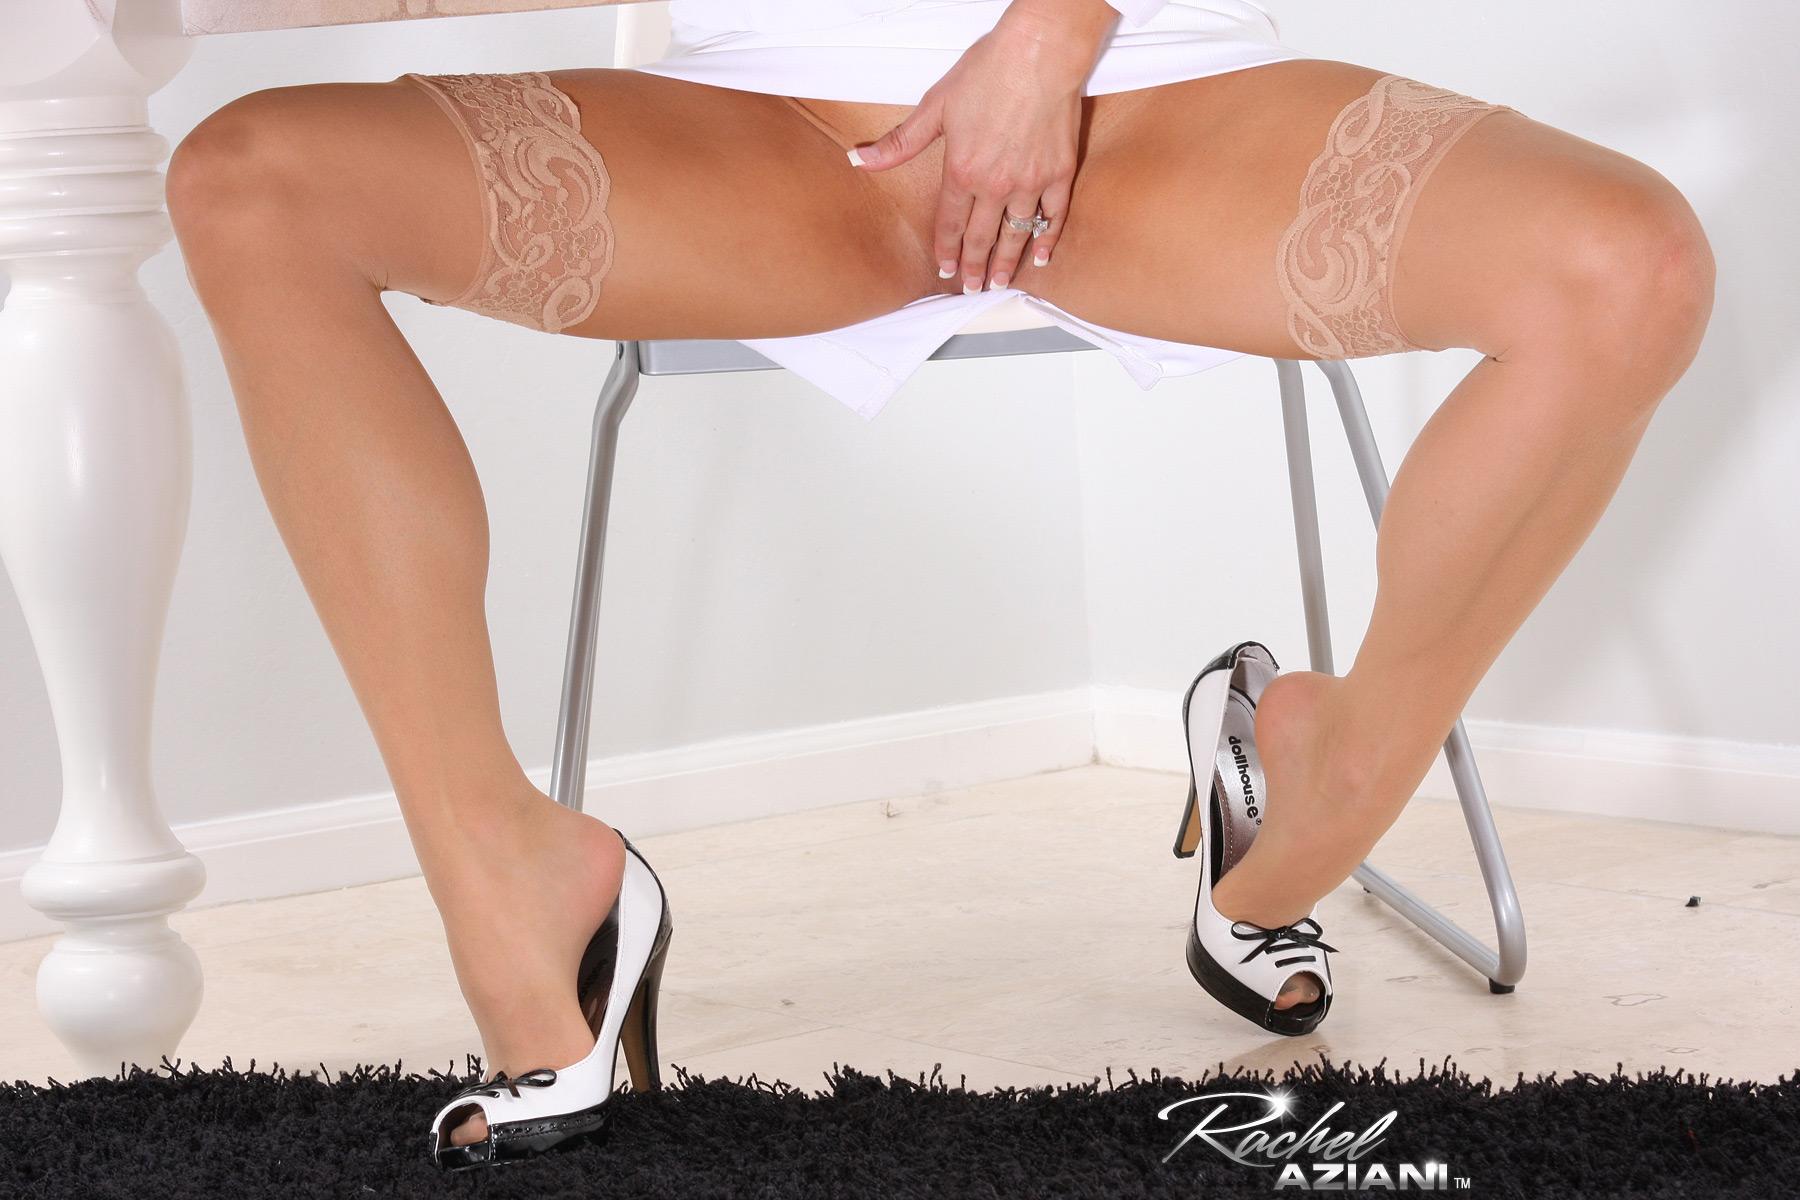 Rachel aziani sexy secretary